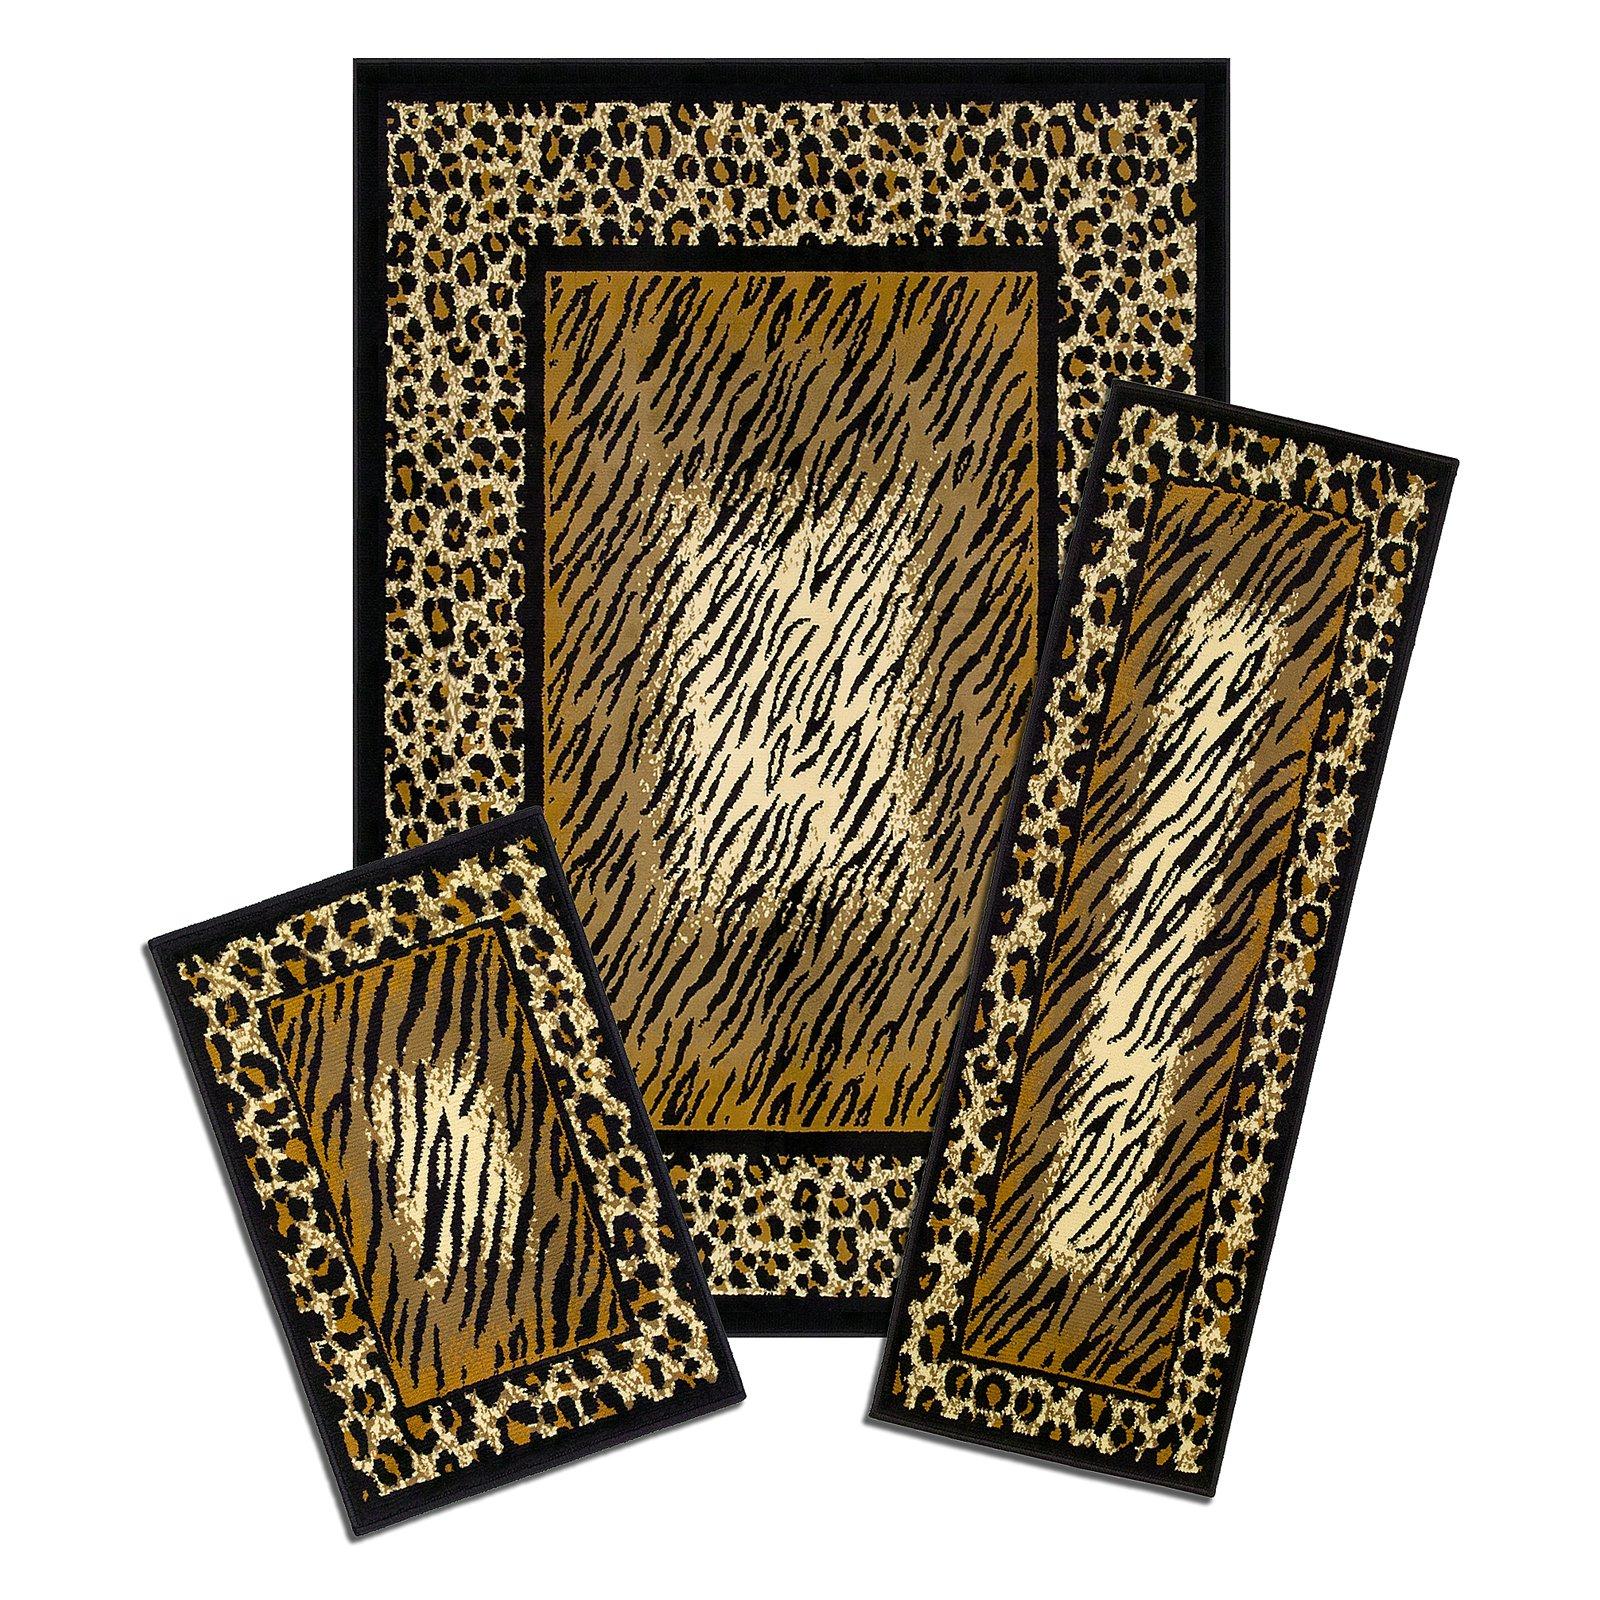 Capri 3 Piece Rug Set, Leopard Skin